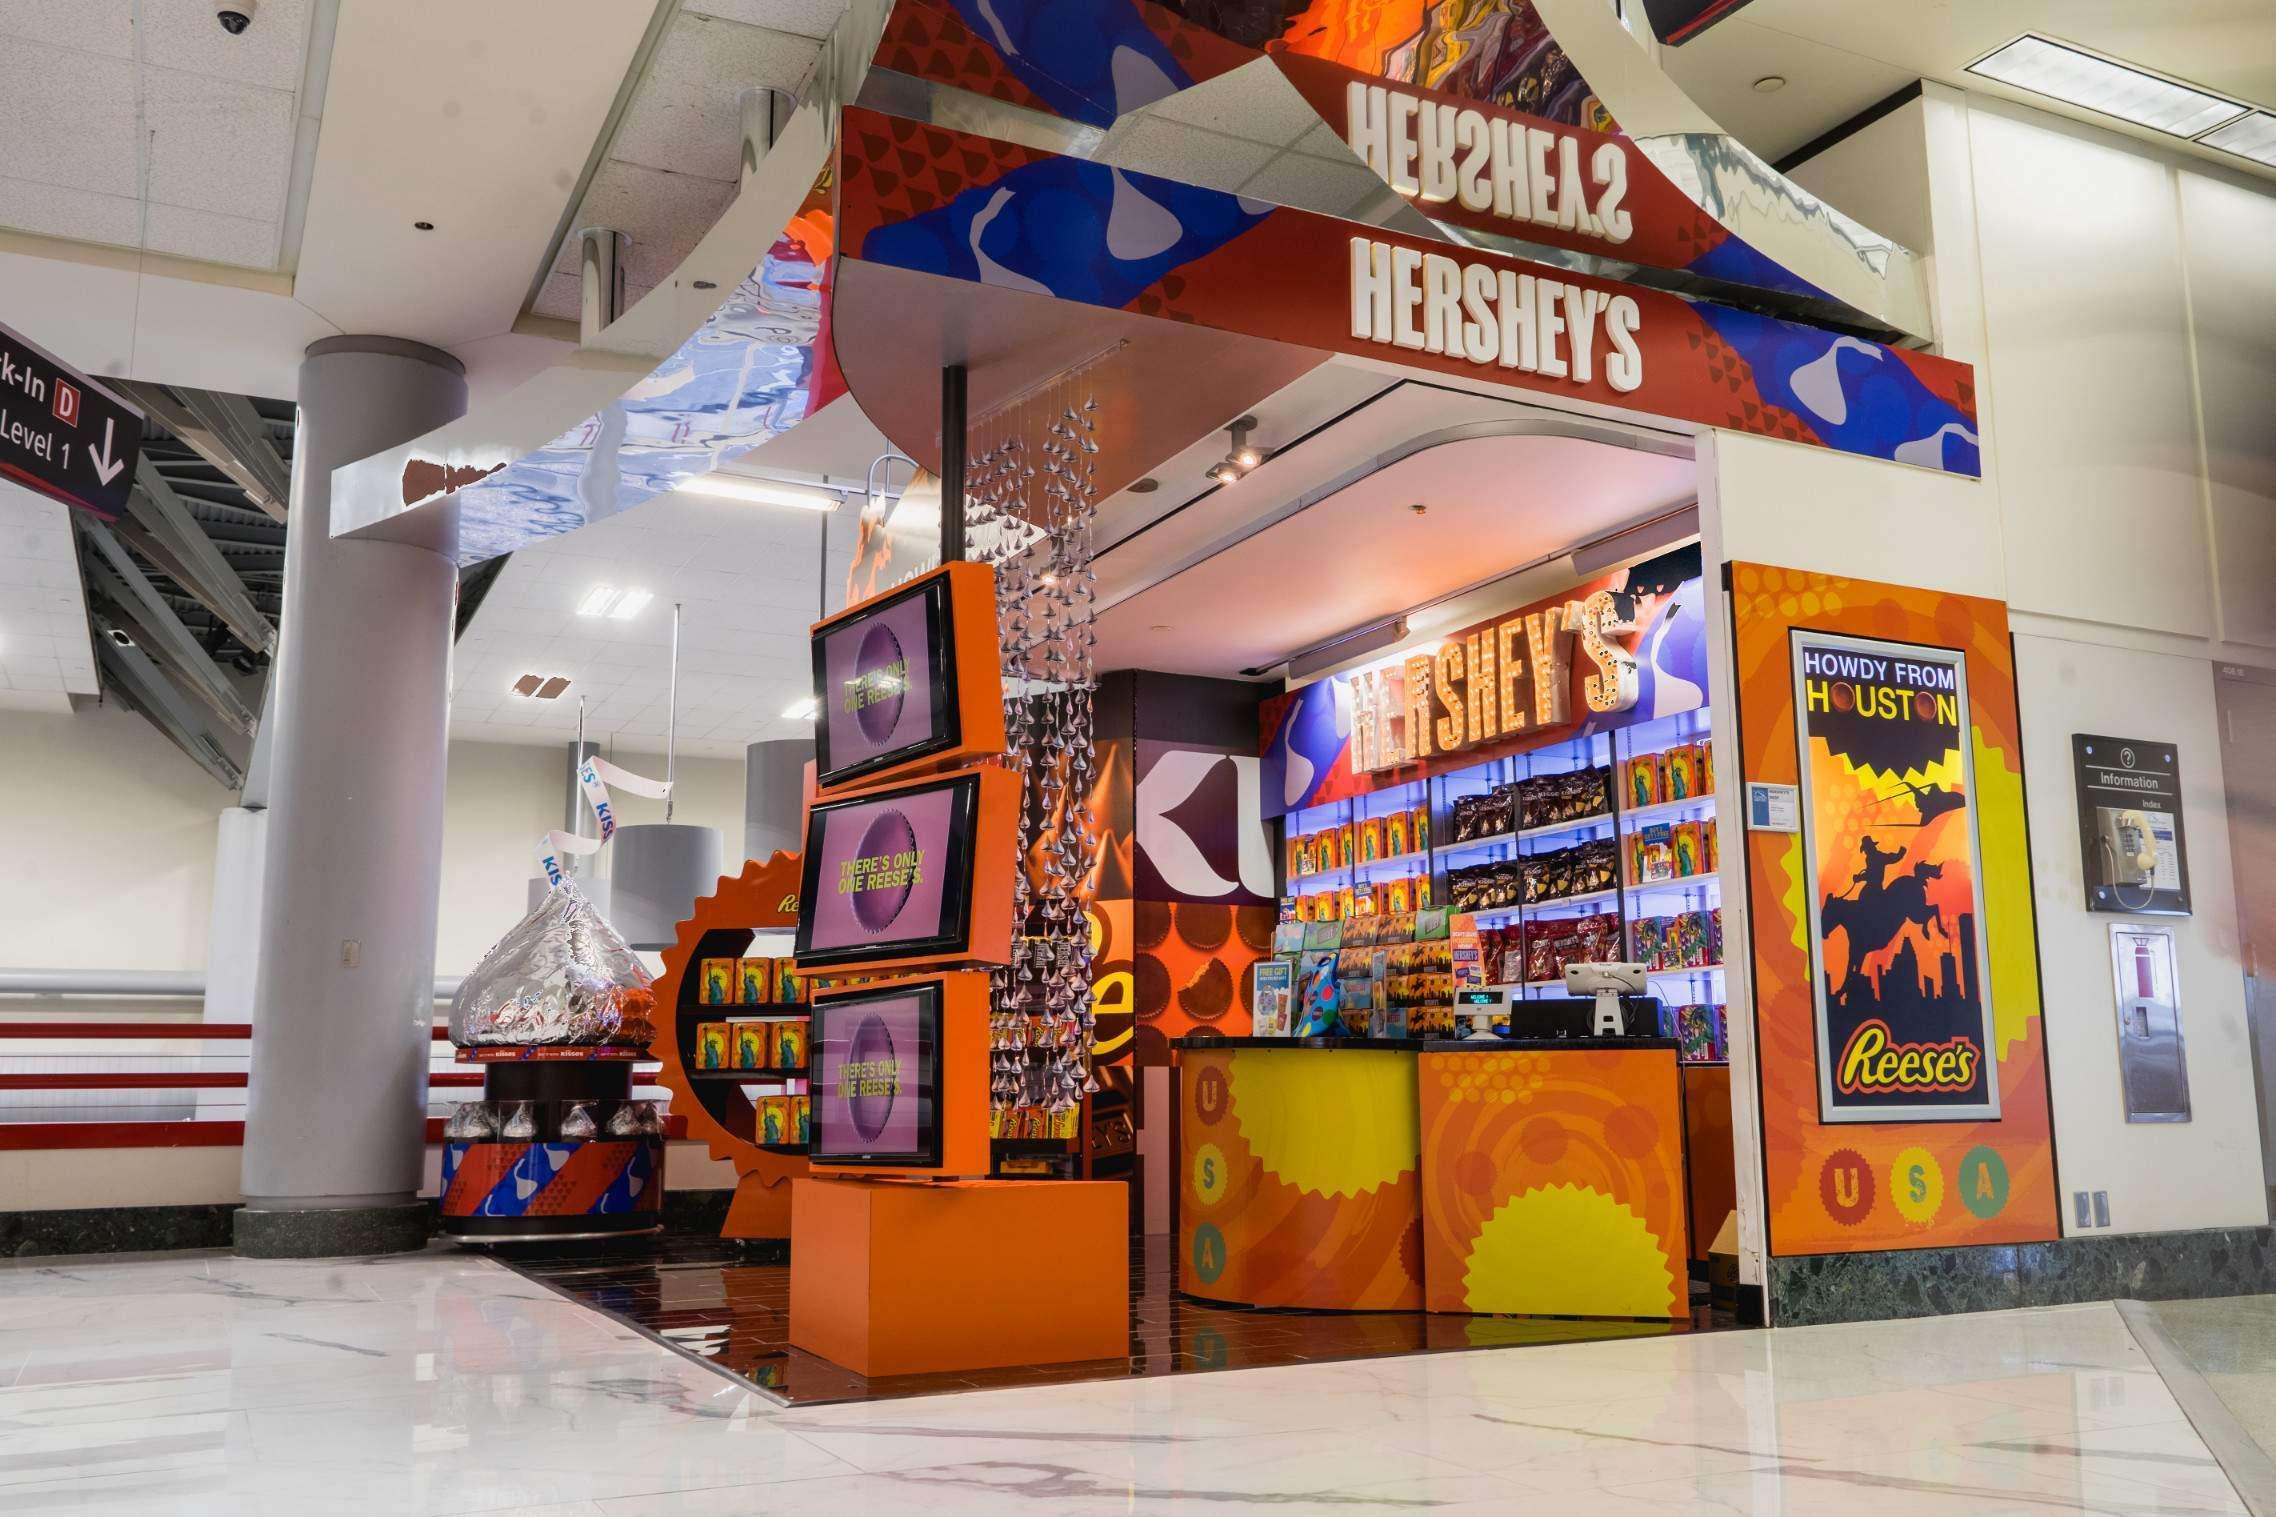 IAH - ATU Hershey's Kiosk - Terminal D